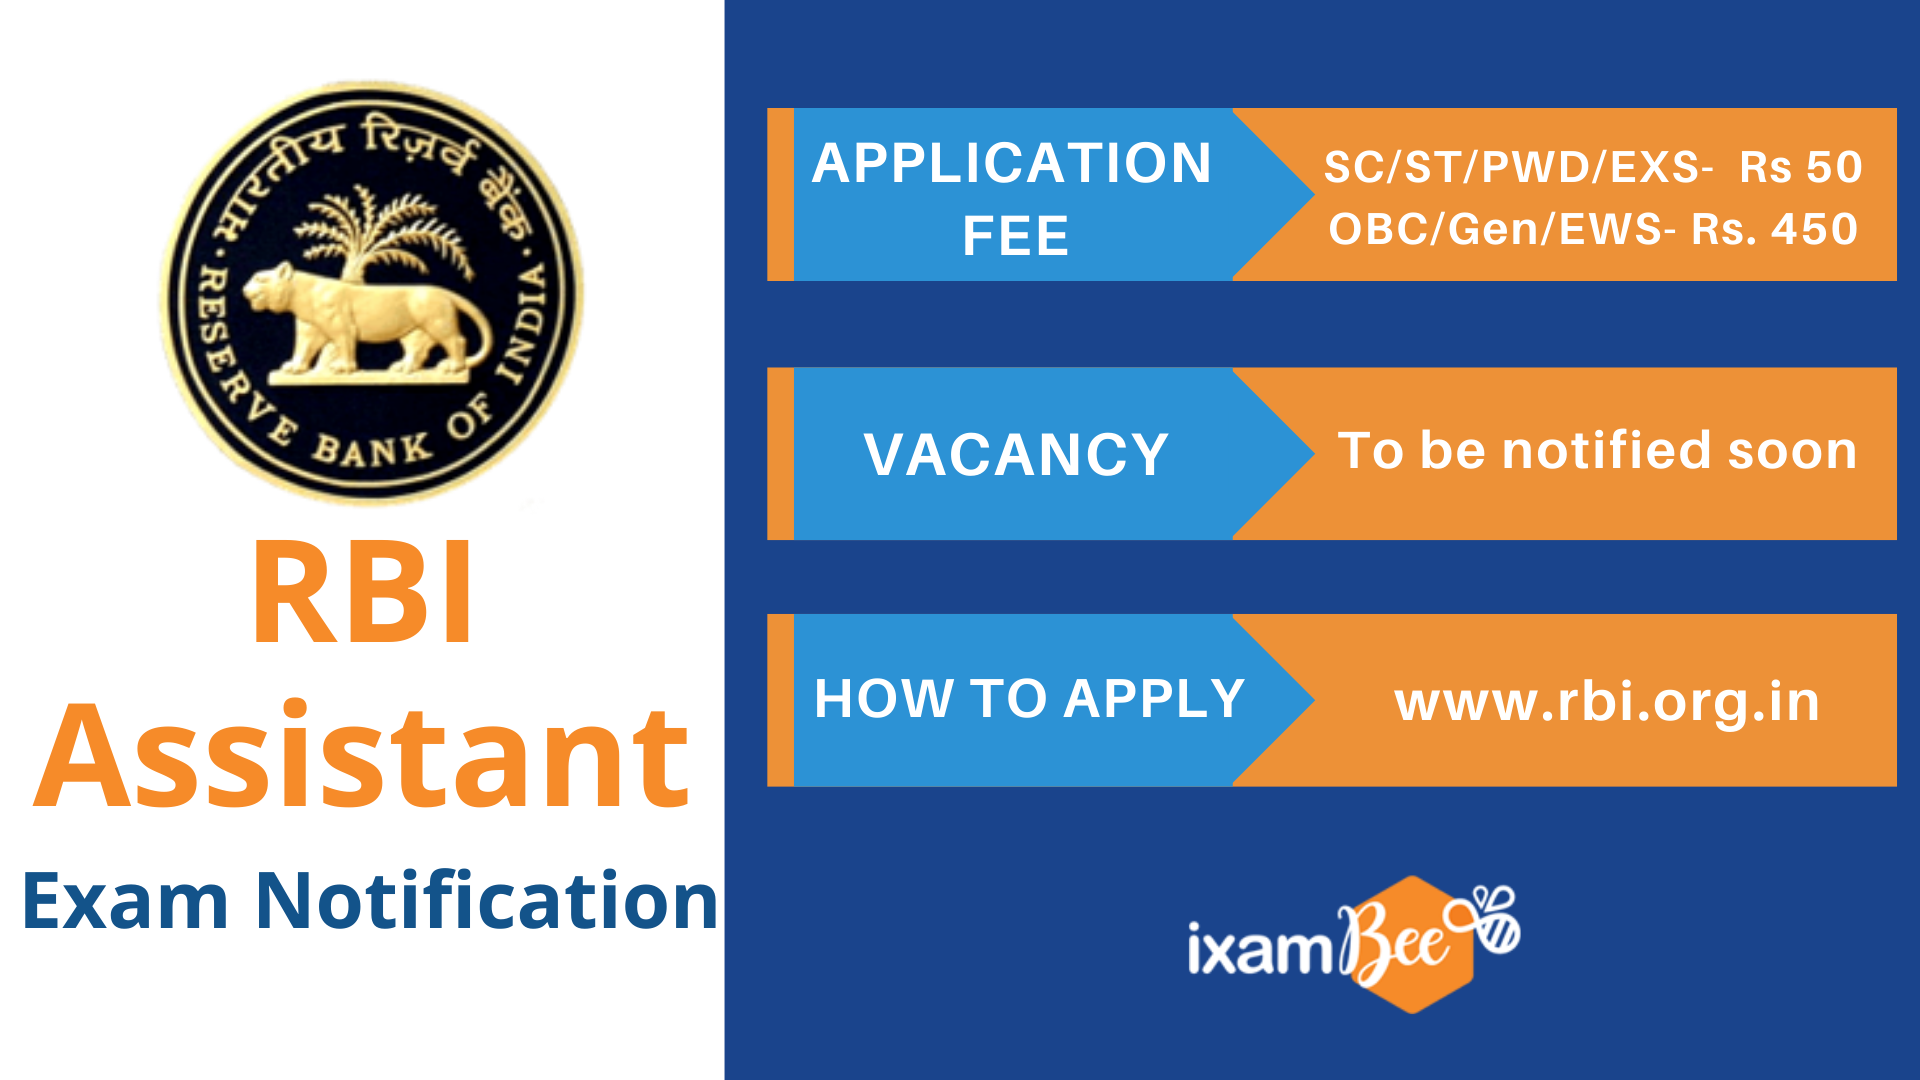 RBI Assistant Exam Notification